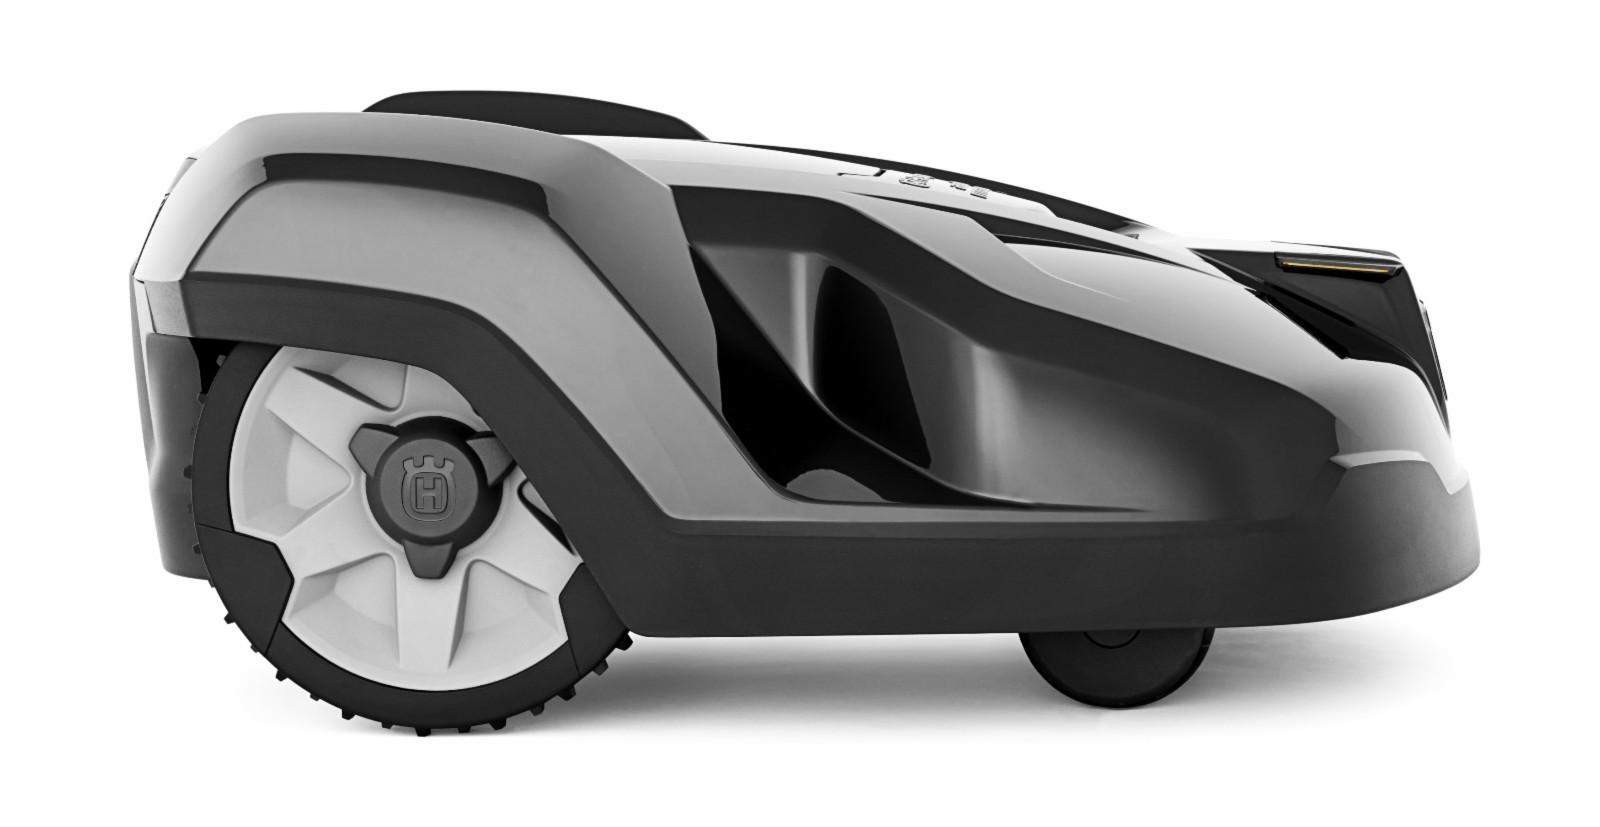 Husqvarna Automower 320 robotklipper | FINN.no